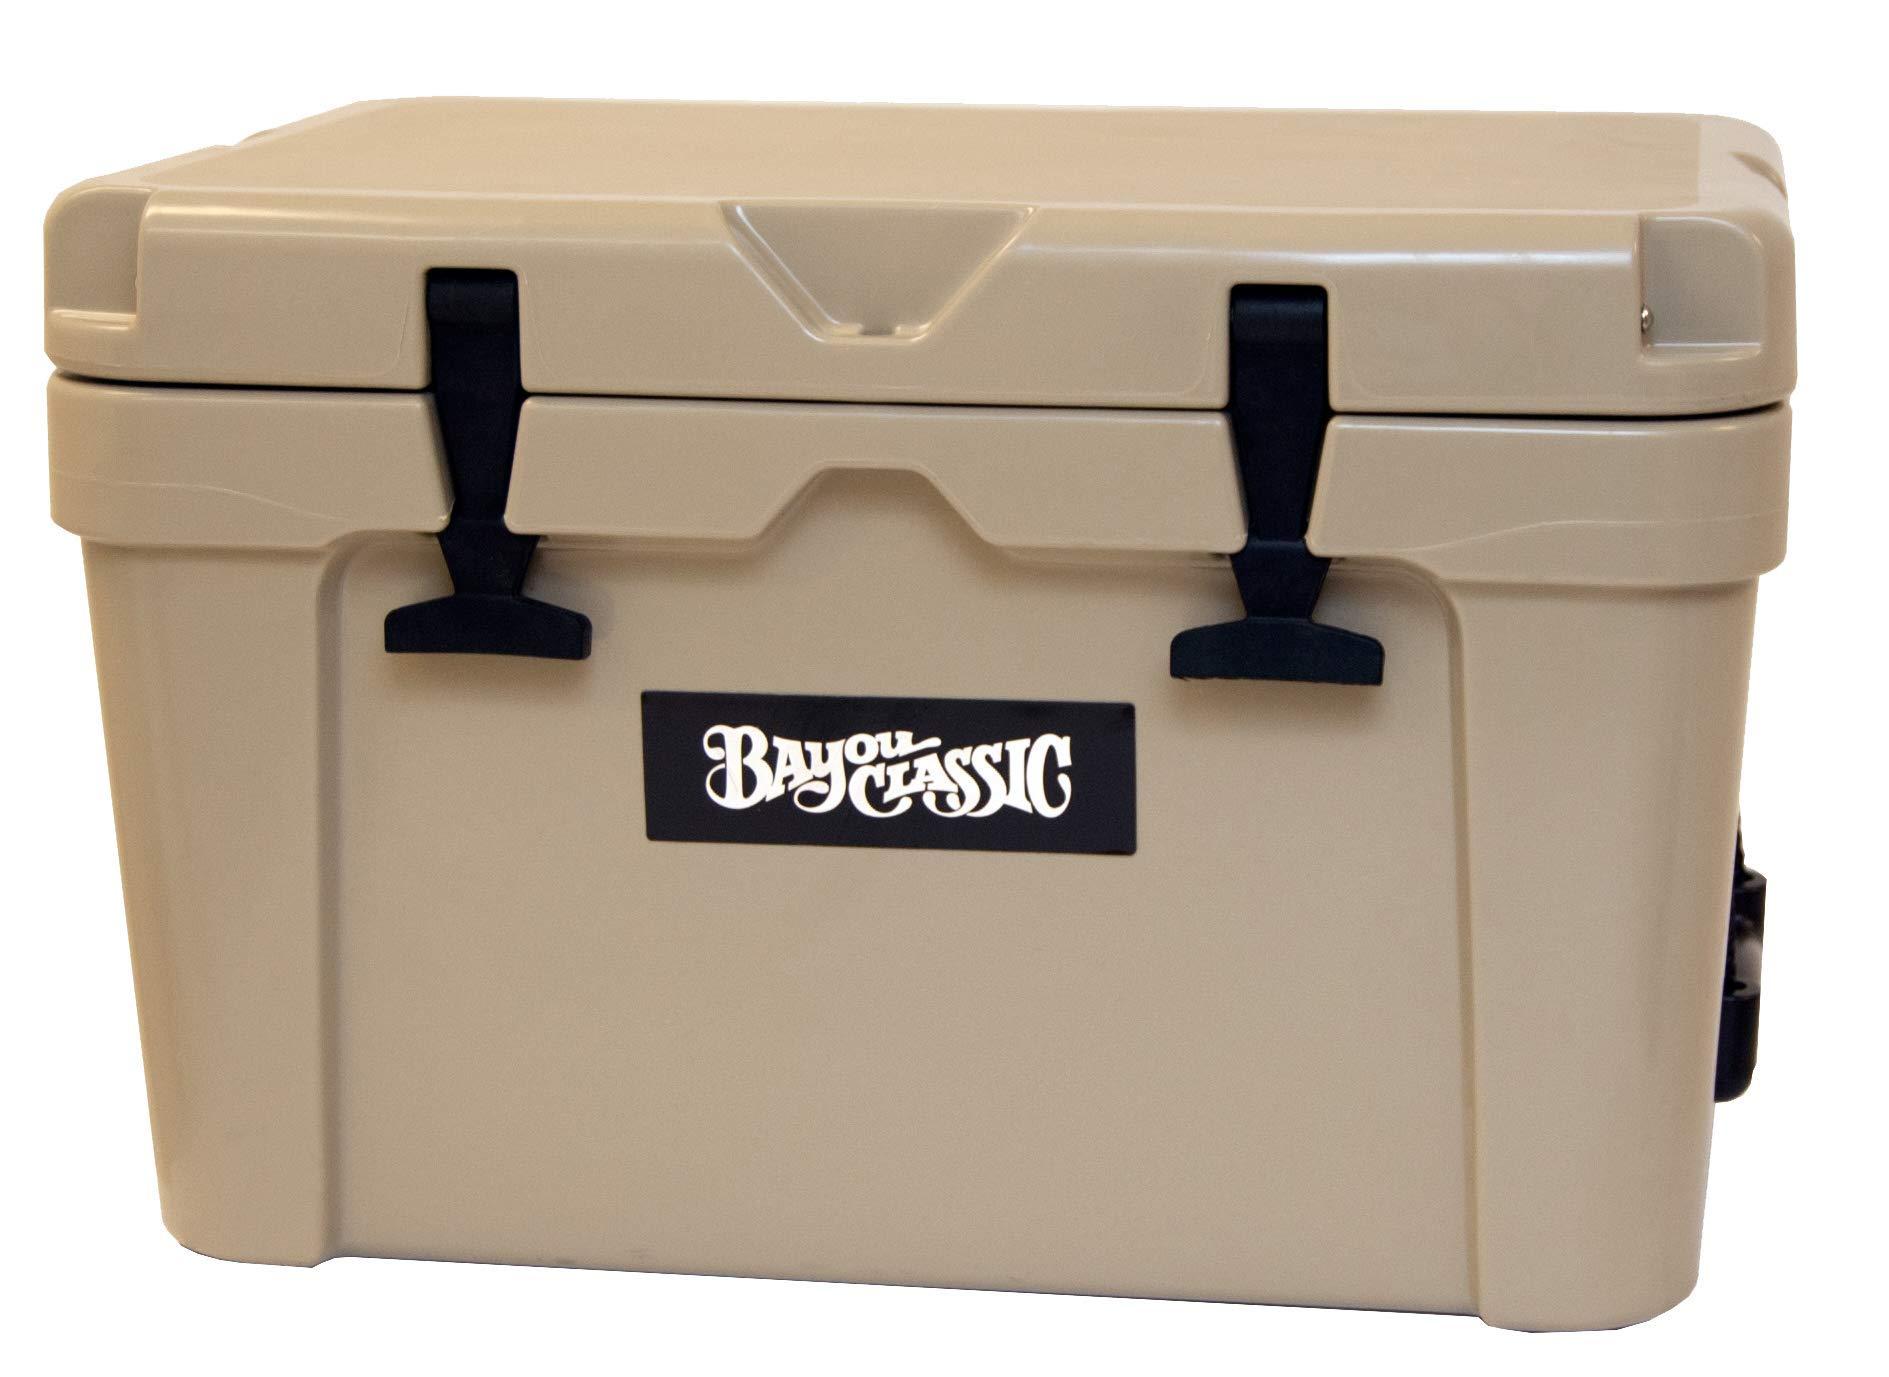 Bayou Classic BC25T BC25T-25-qt Bayou Cooler, 25qt, Tan by Bayou Classic